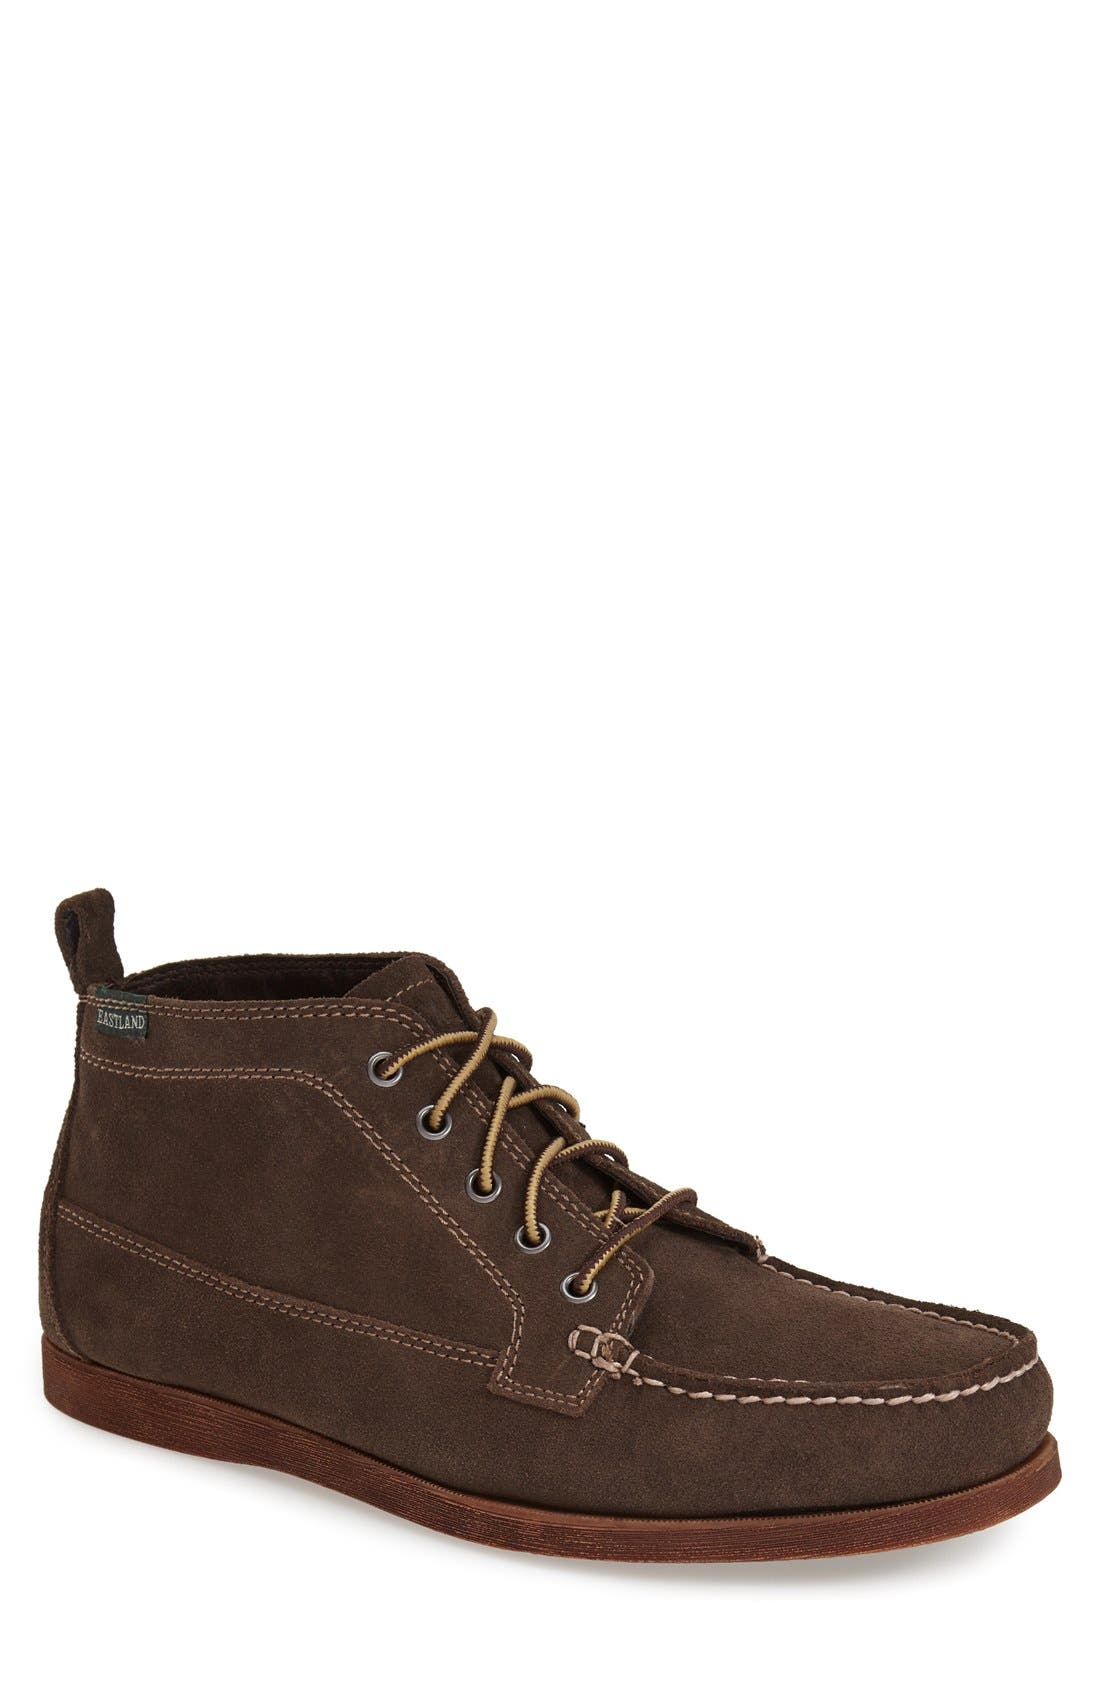 seneca men Find eastland seneca and quoddy from a vast selection of men's boots get great deals on ebay.